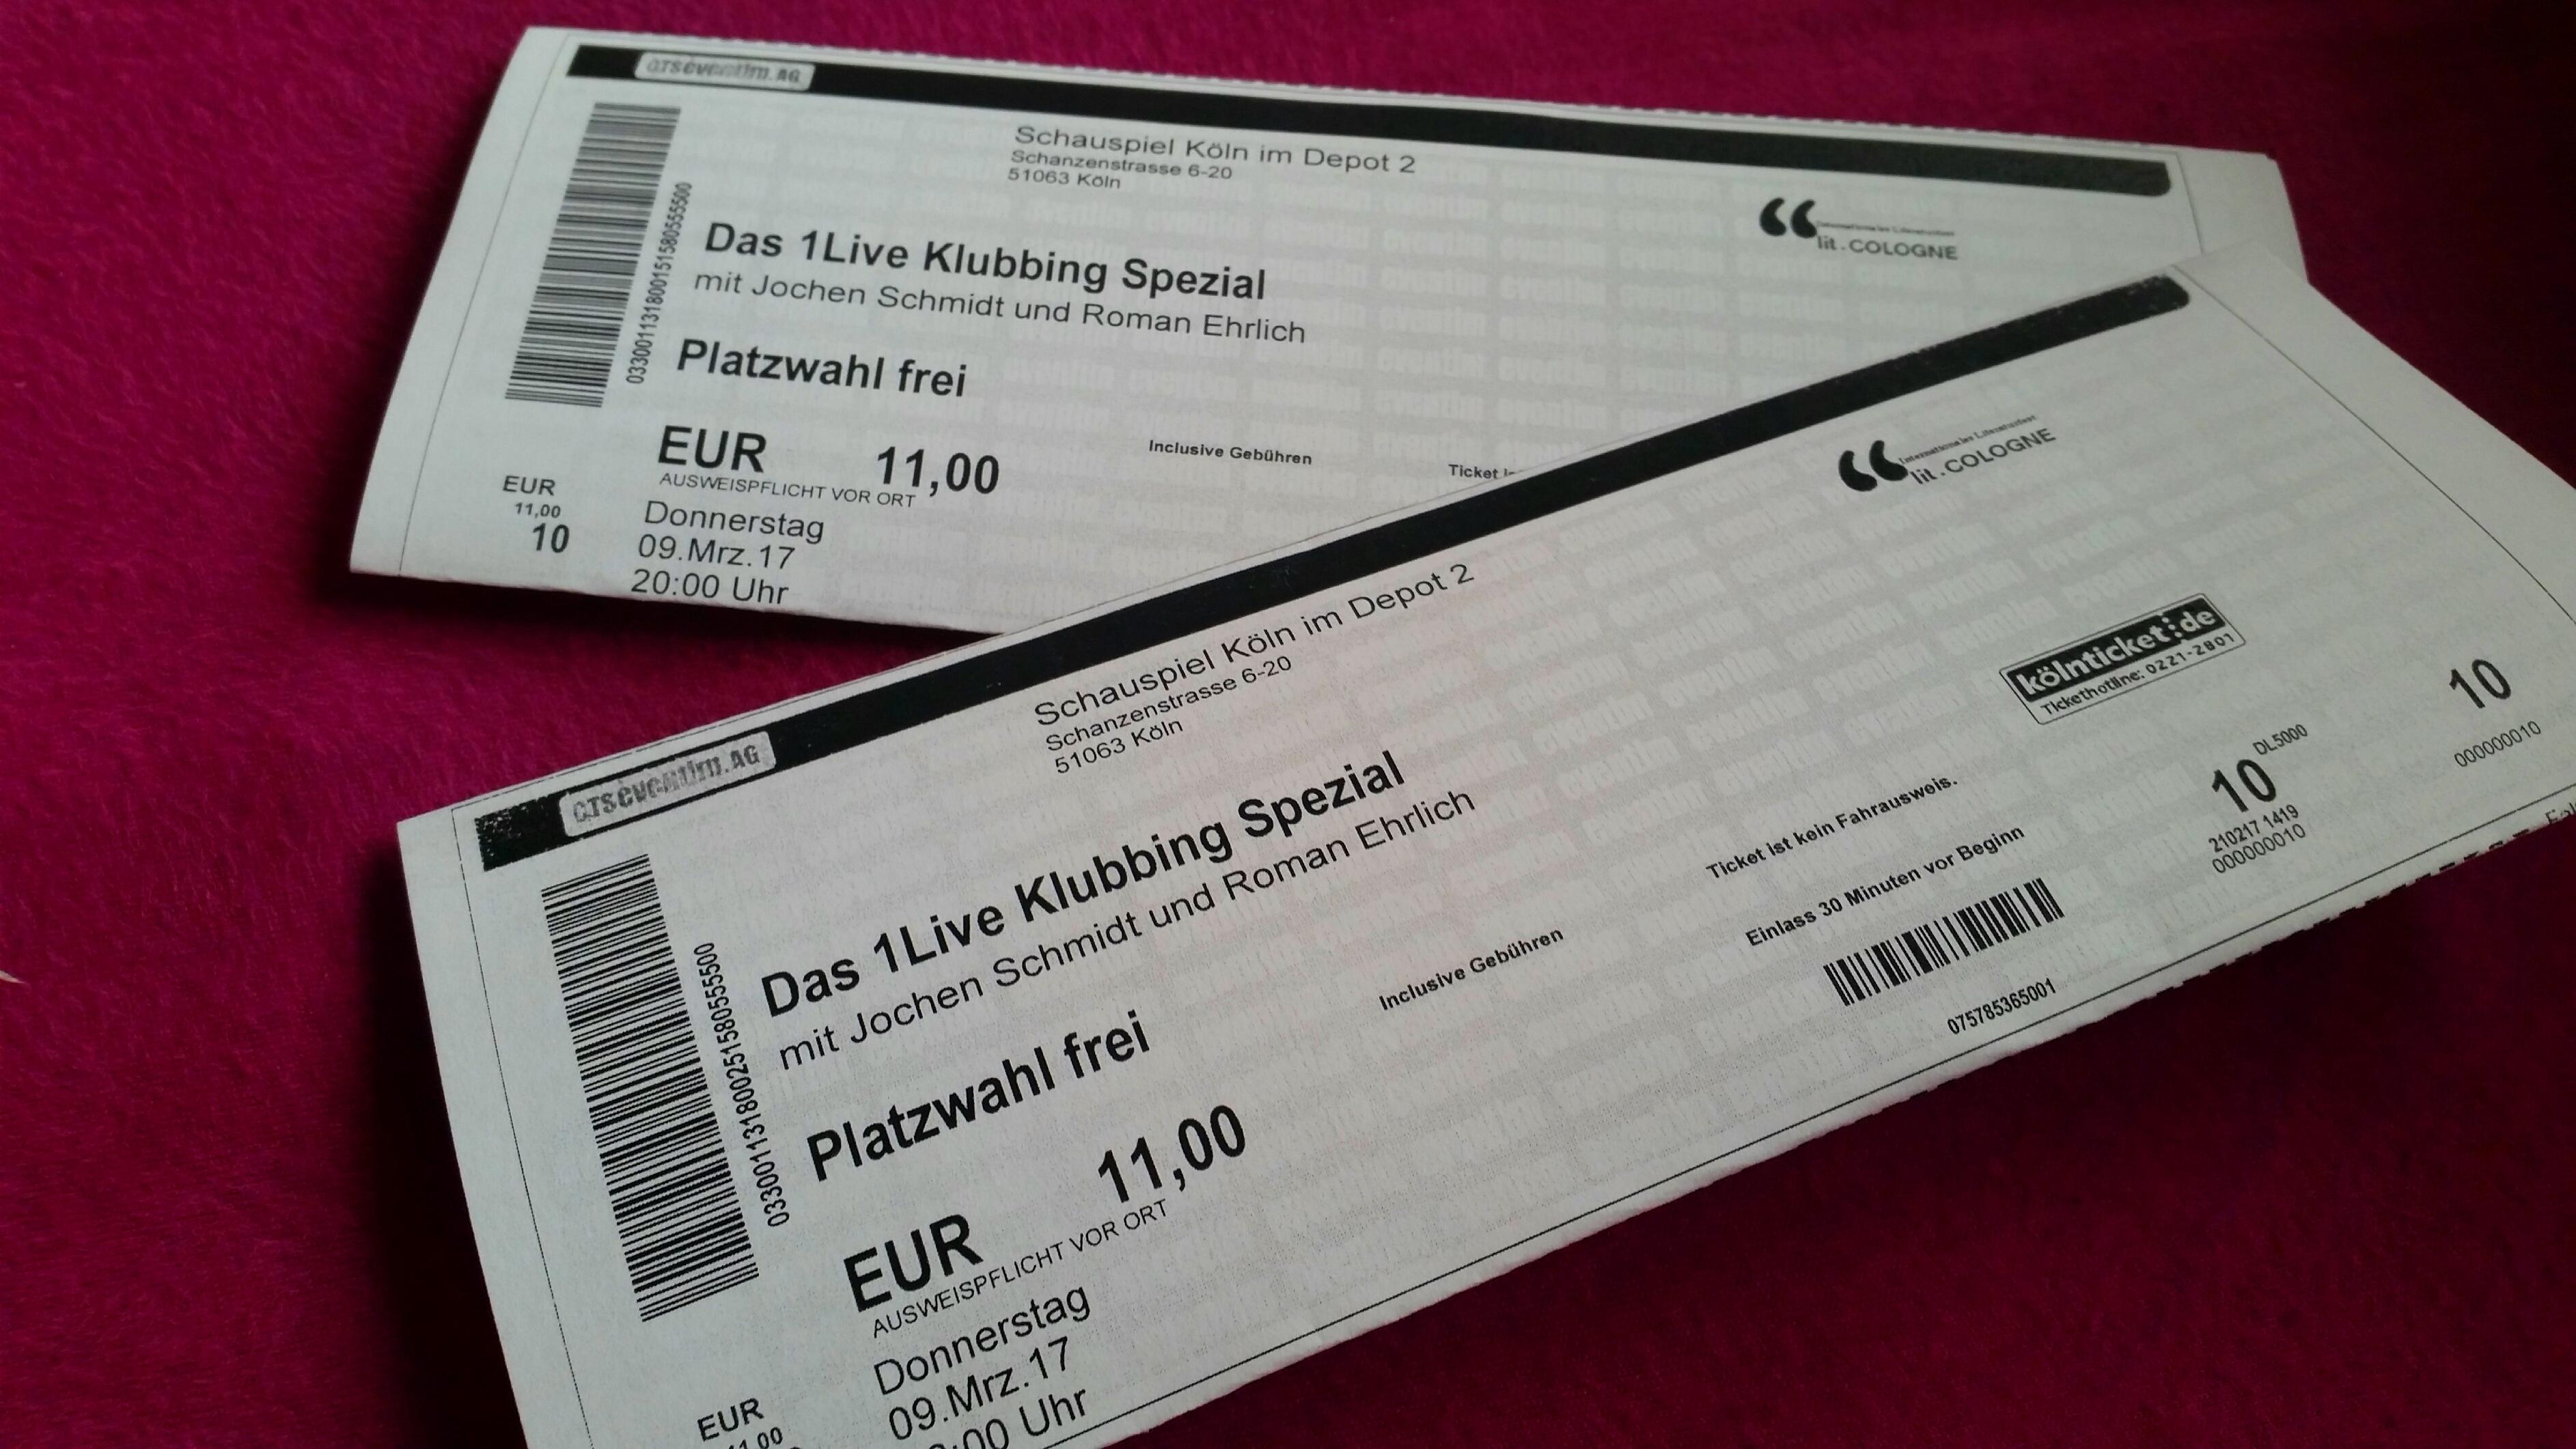 Lesung lit.cologne Tickets